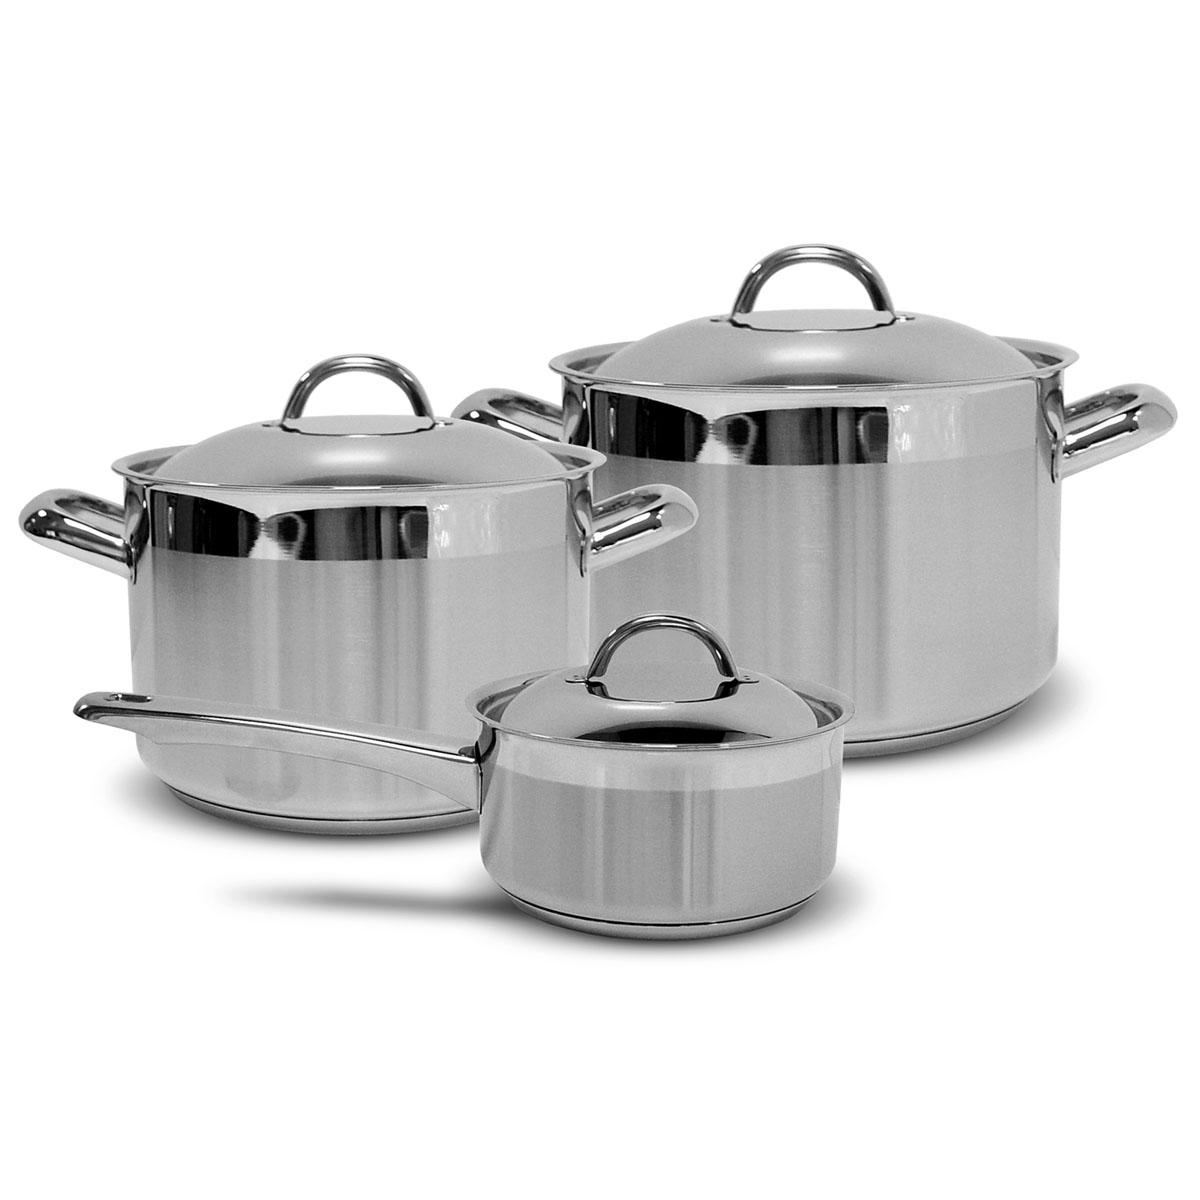 Набор посуды Silampos Европа, 6 предметов54 009312632123BM0217 Набор 3пр.ЕВРОПА Характеристики: Материал: сталь.Размер: 330*300*210мм.Артикул: 632123BM0217.